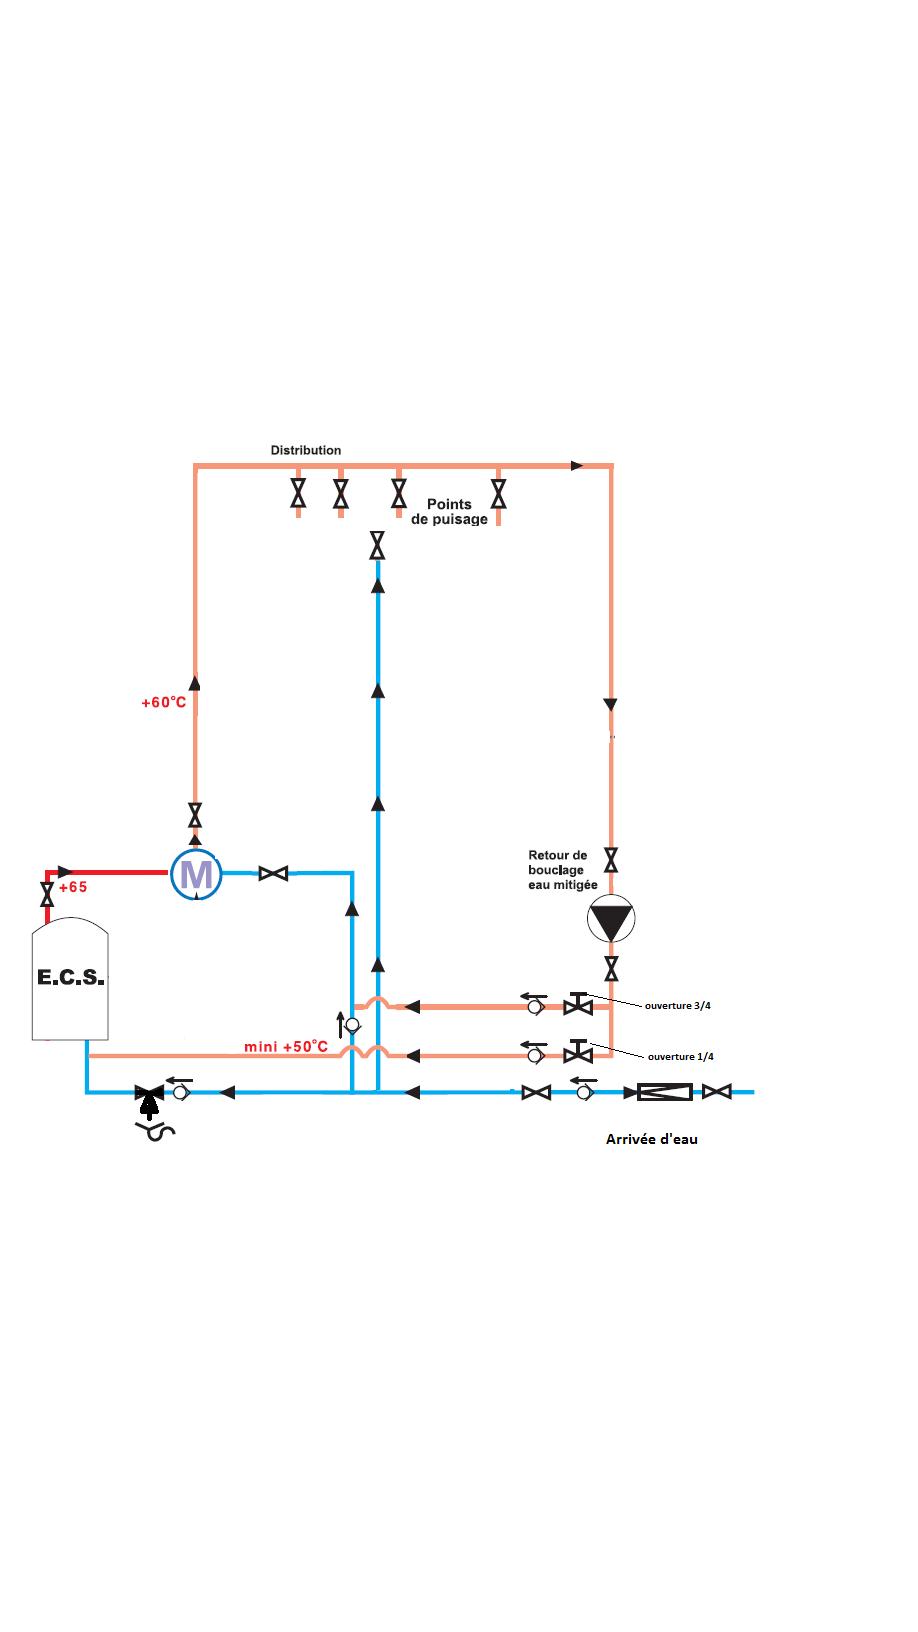 schema boucle ECS.png, 45.99 kb, 918 x 1632